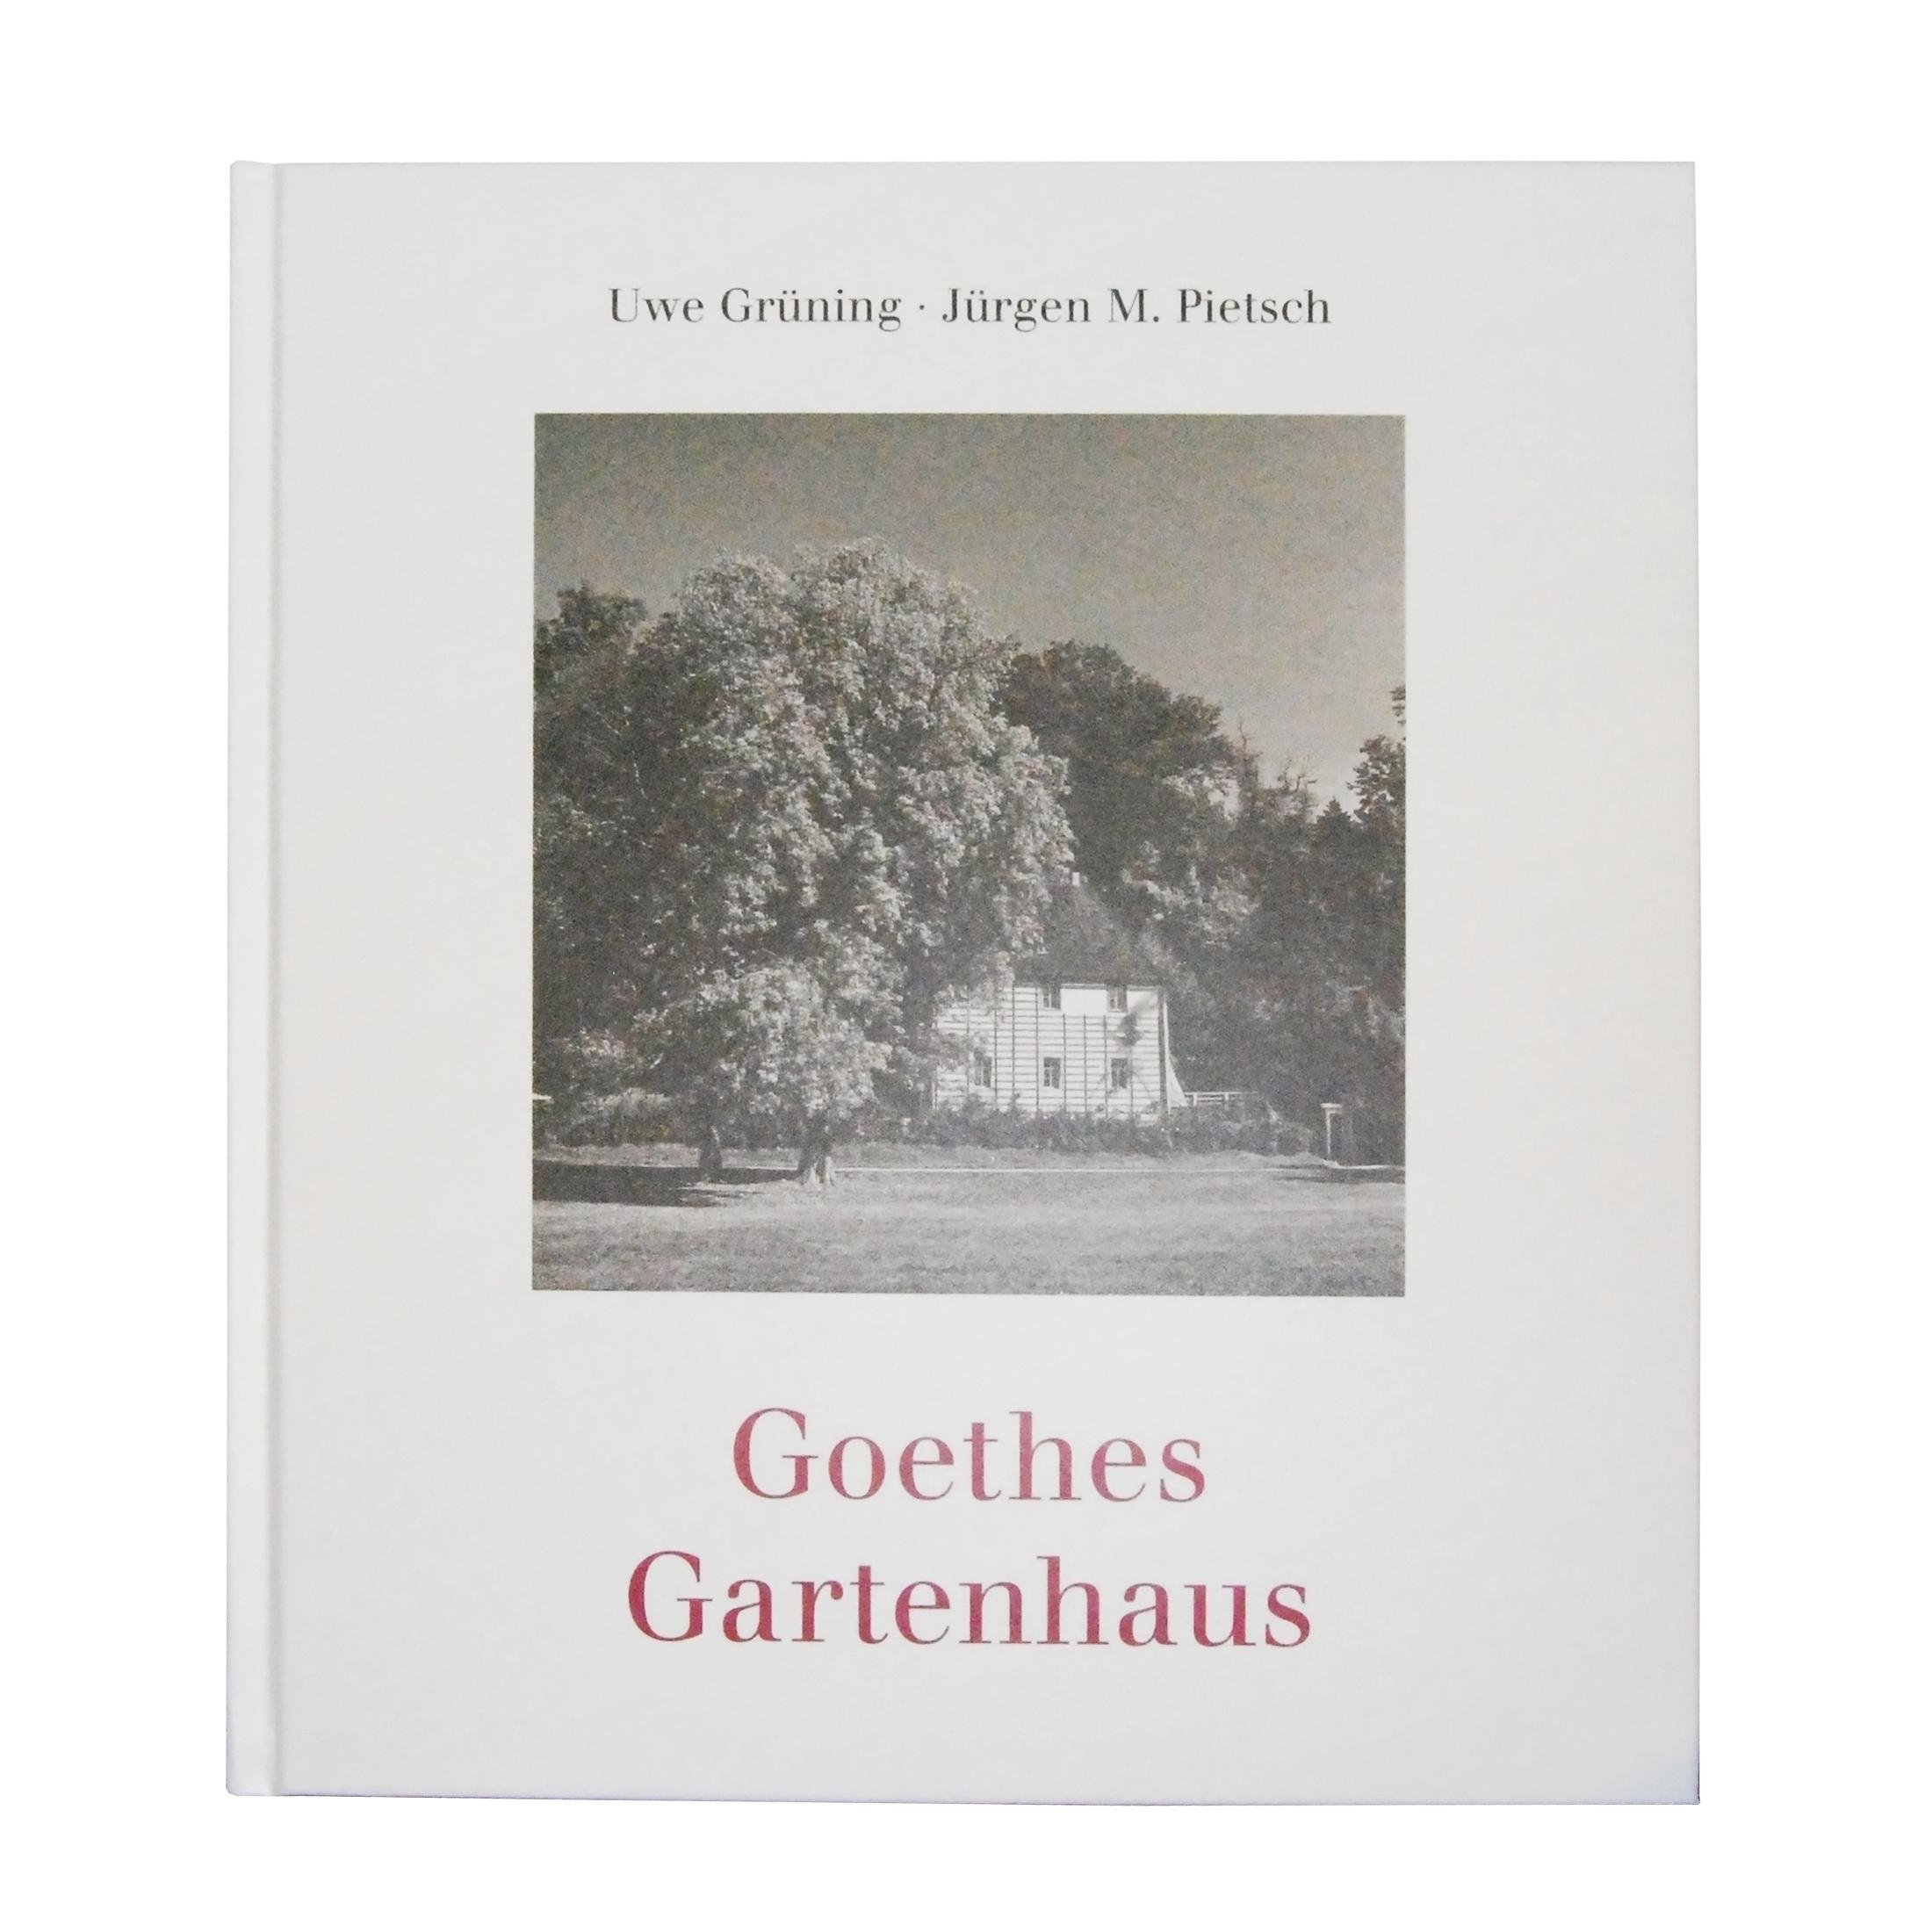 Goethes Gartenhaus, Bildband